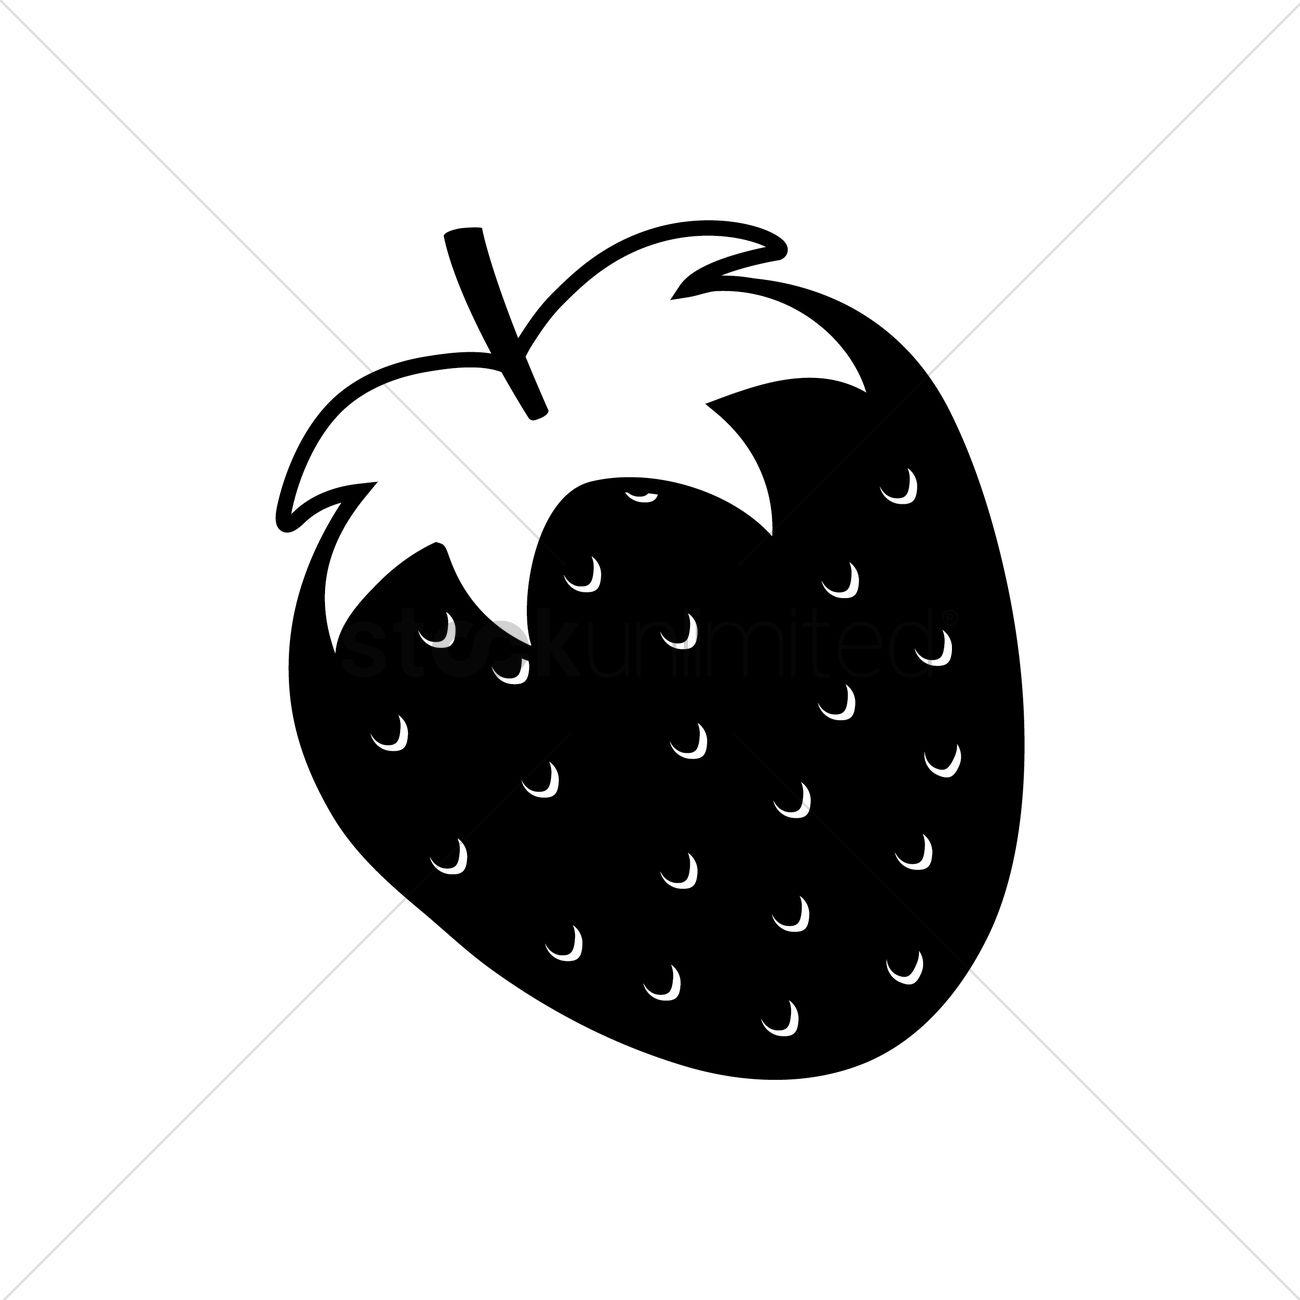 silhouette of strawberry vector image 1447185 clip art leaf images clip art leaf shapes